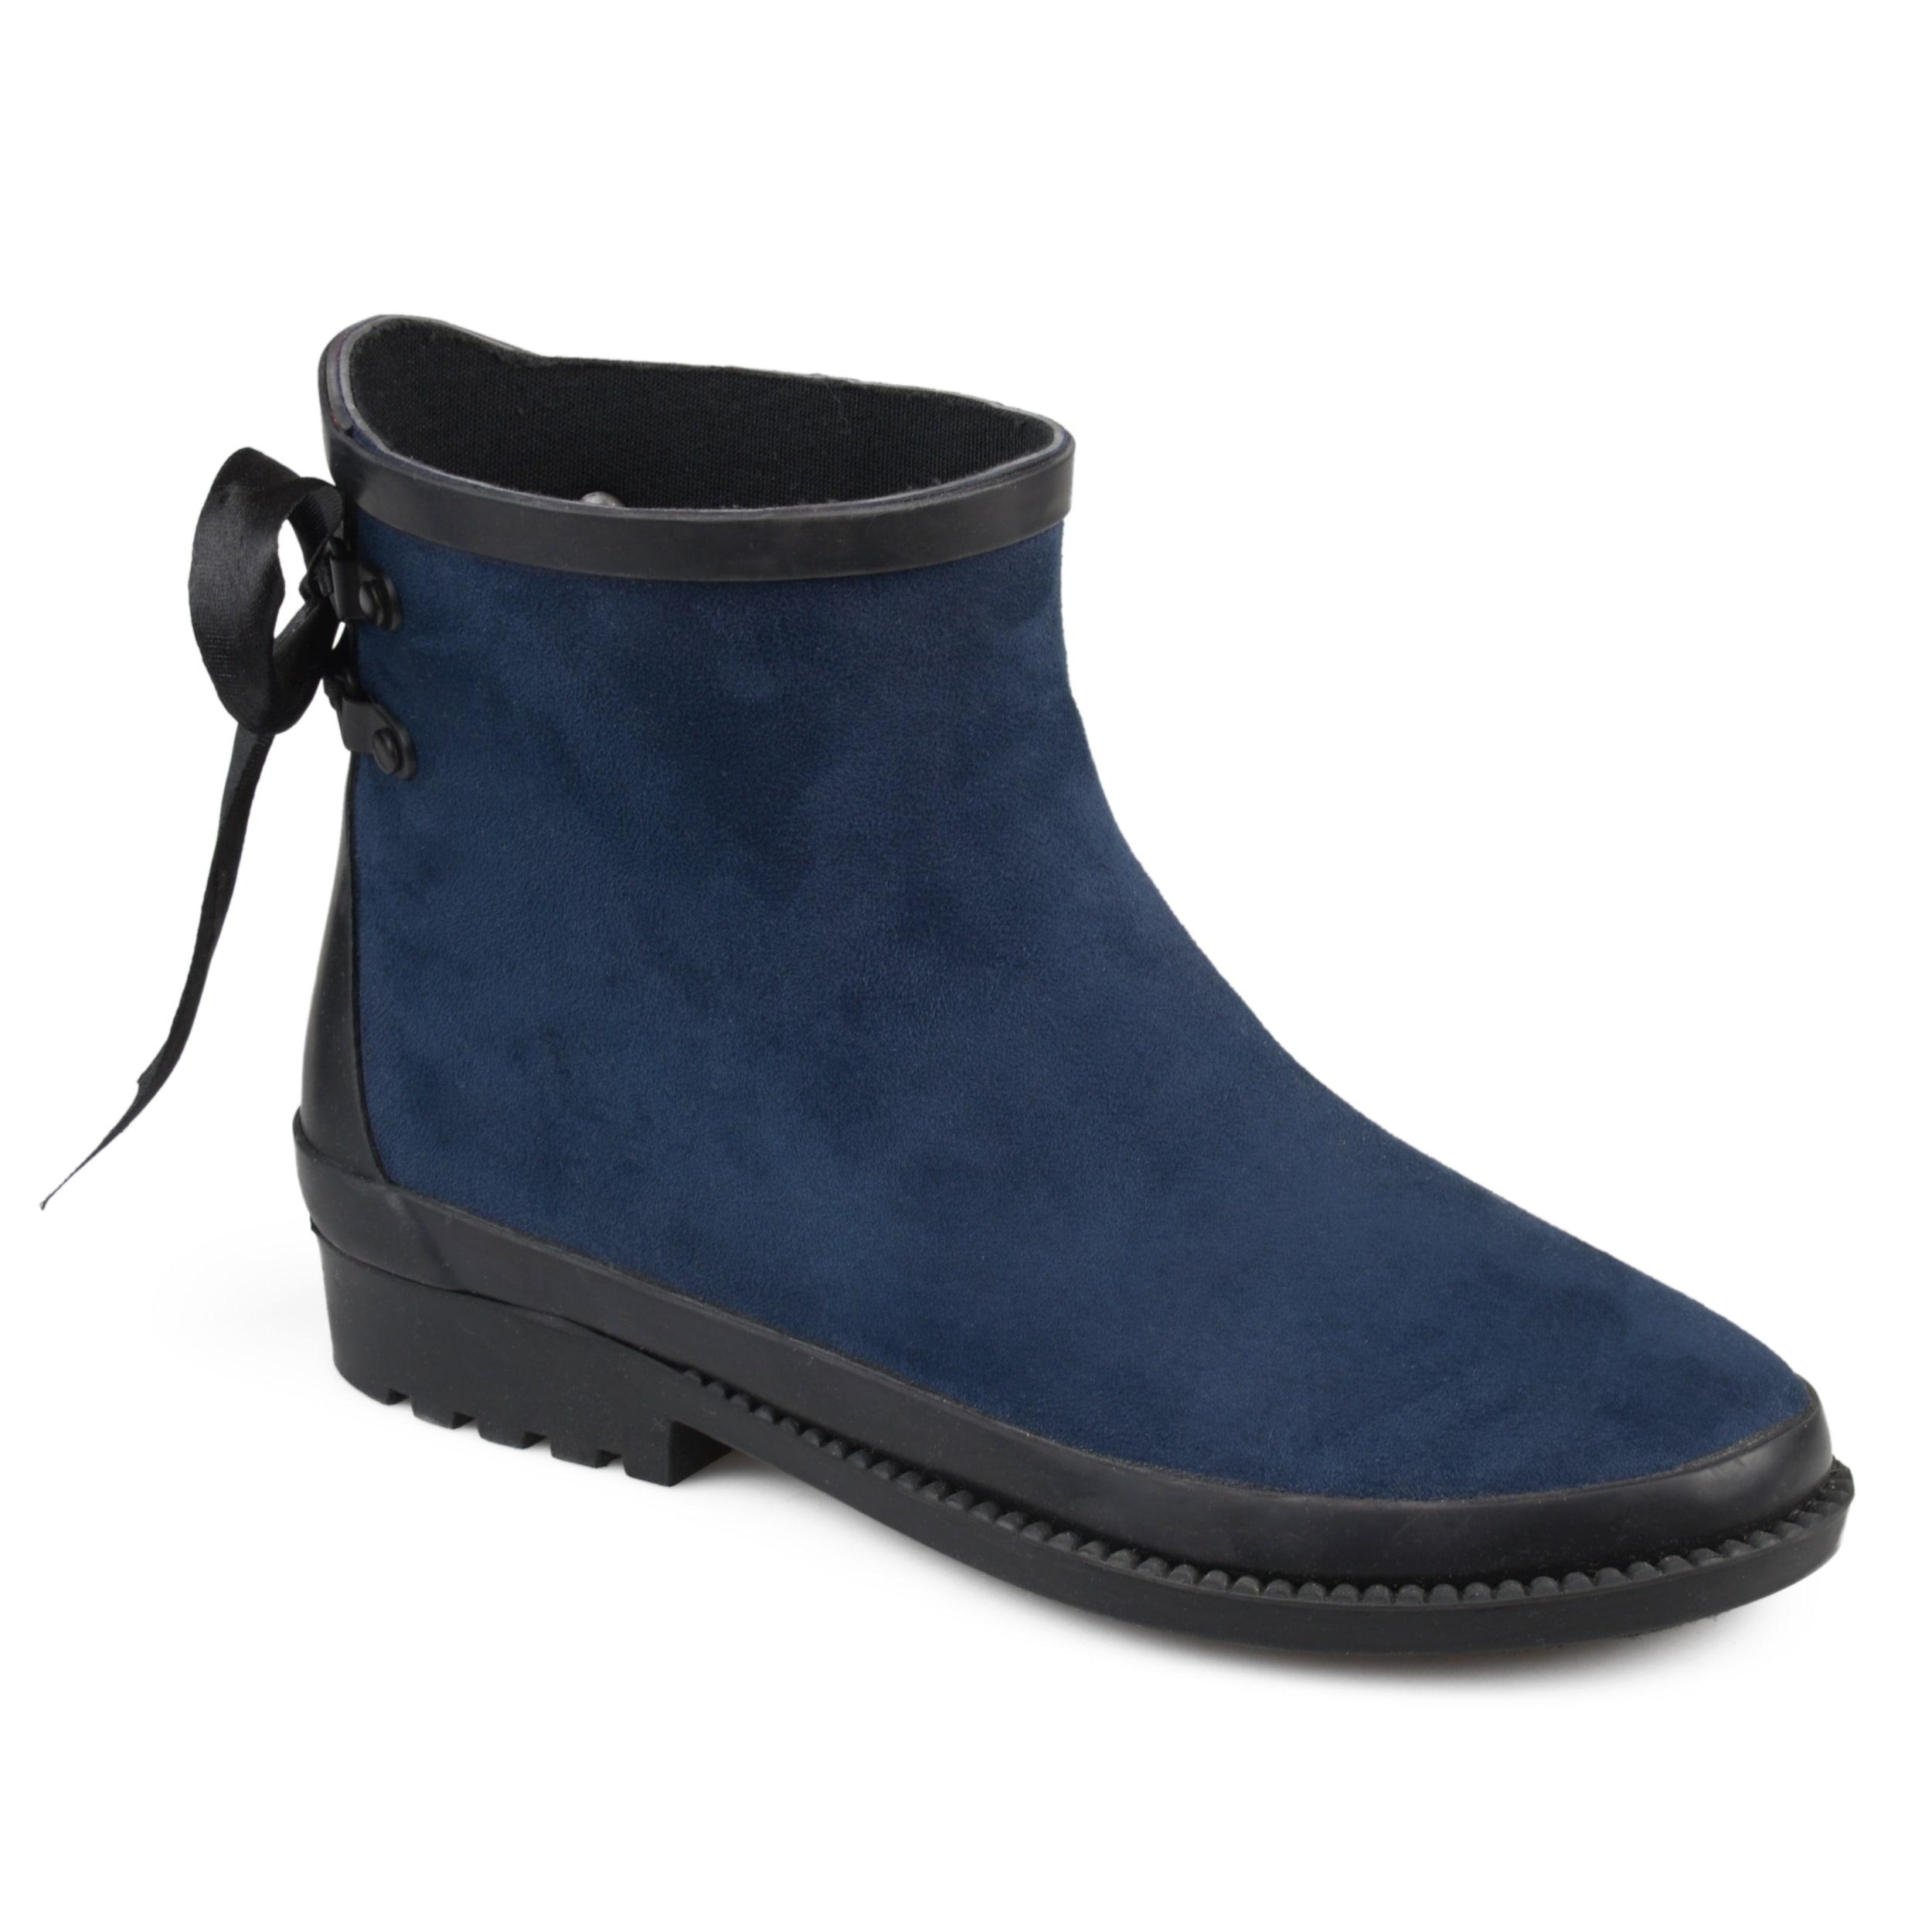 Journee Collection Burke ... Women's Rain Boots wKtc5